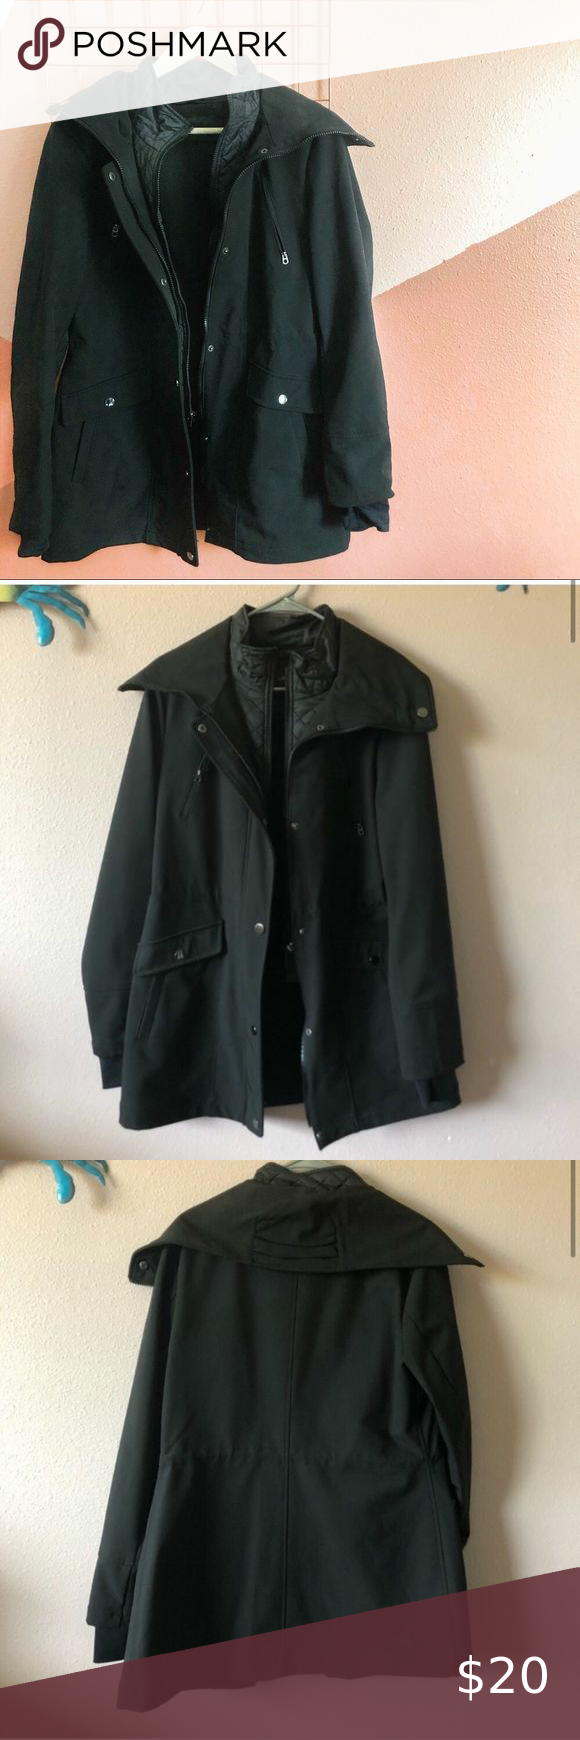 Liz Claiborne Zip Up Black Long Sleeve Jacket Has Inner Lining Vest That Goes Down To Waist J Black Long Sleeve Jacket Long Sleeves Jacket Black Long Sleeve [ 1740 x 580 Pixel ]